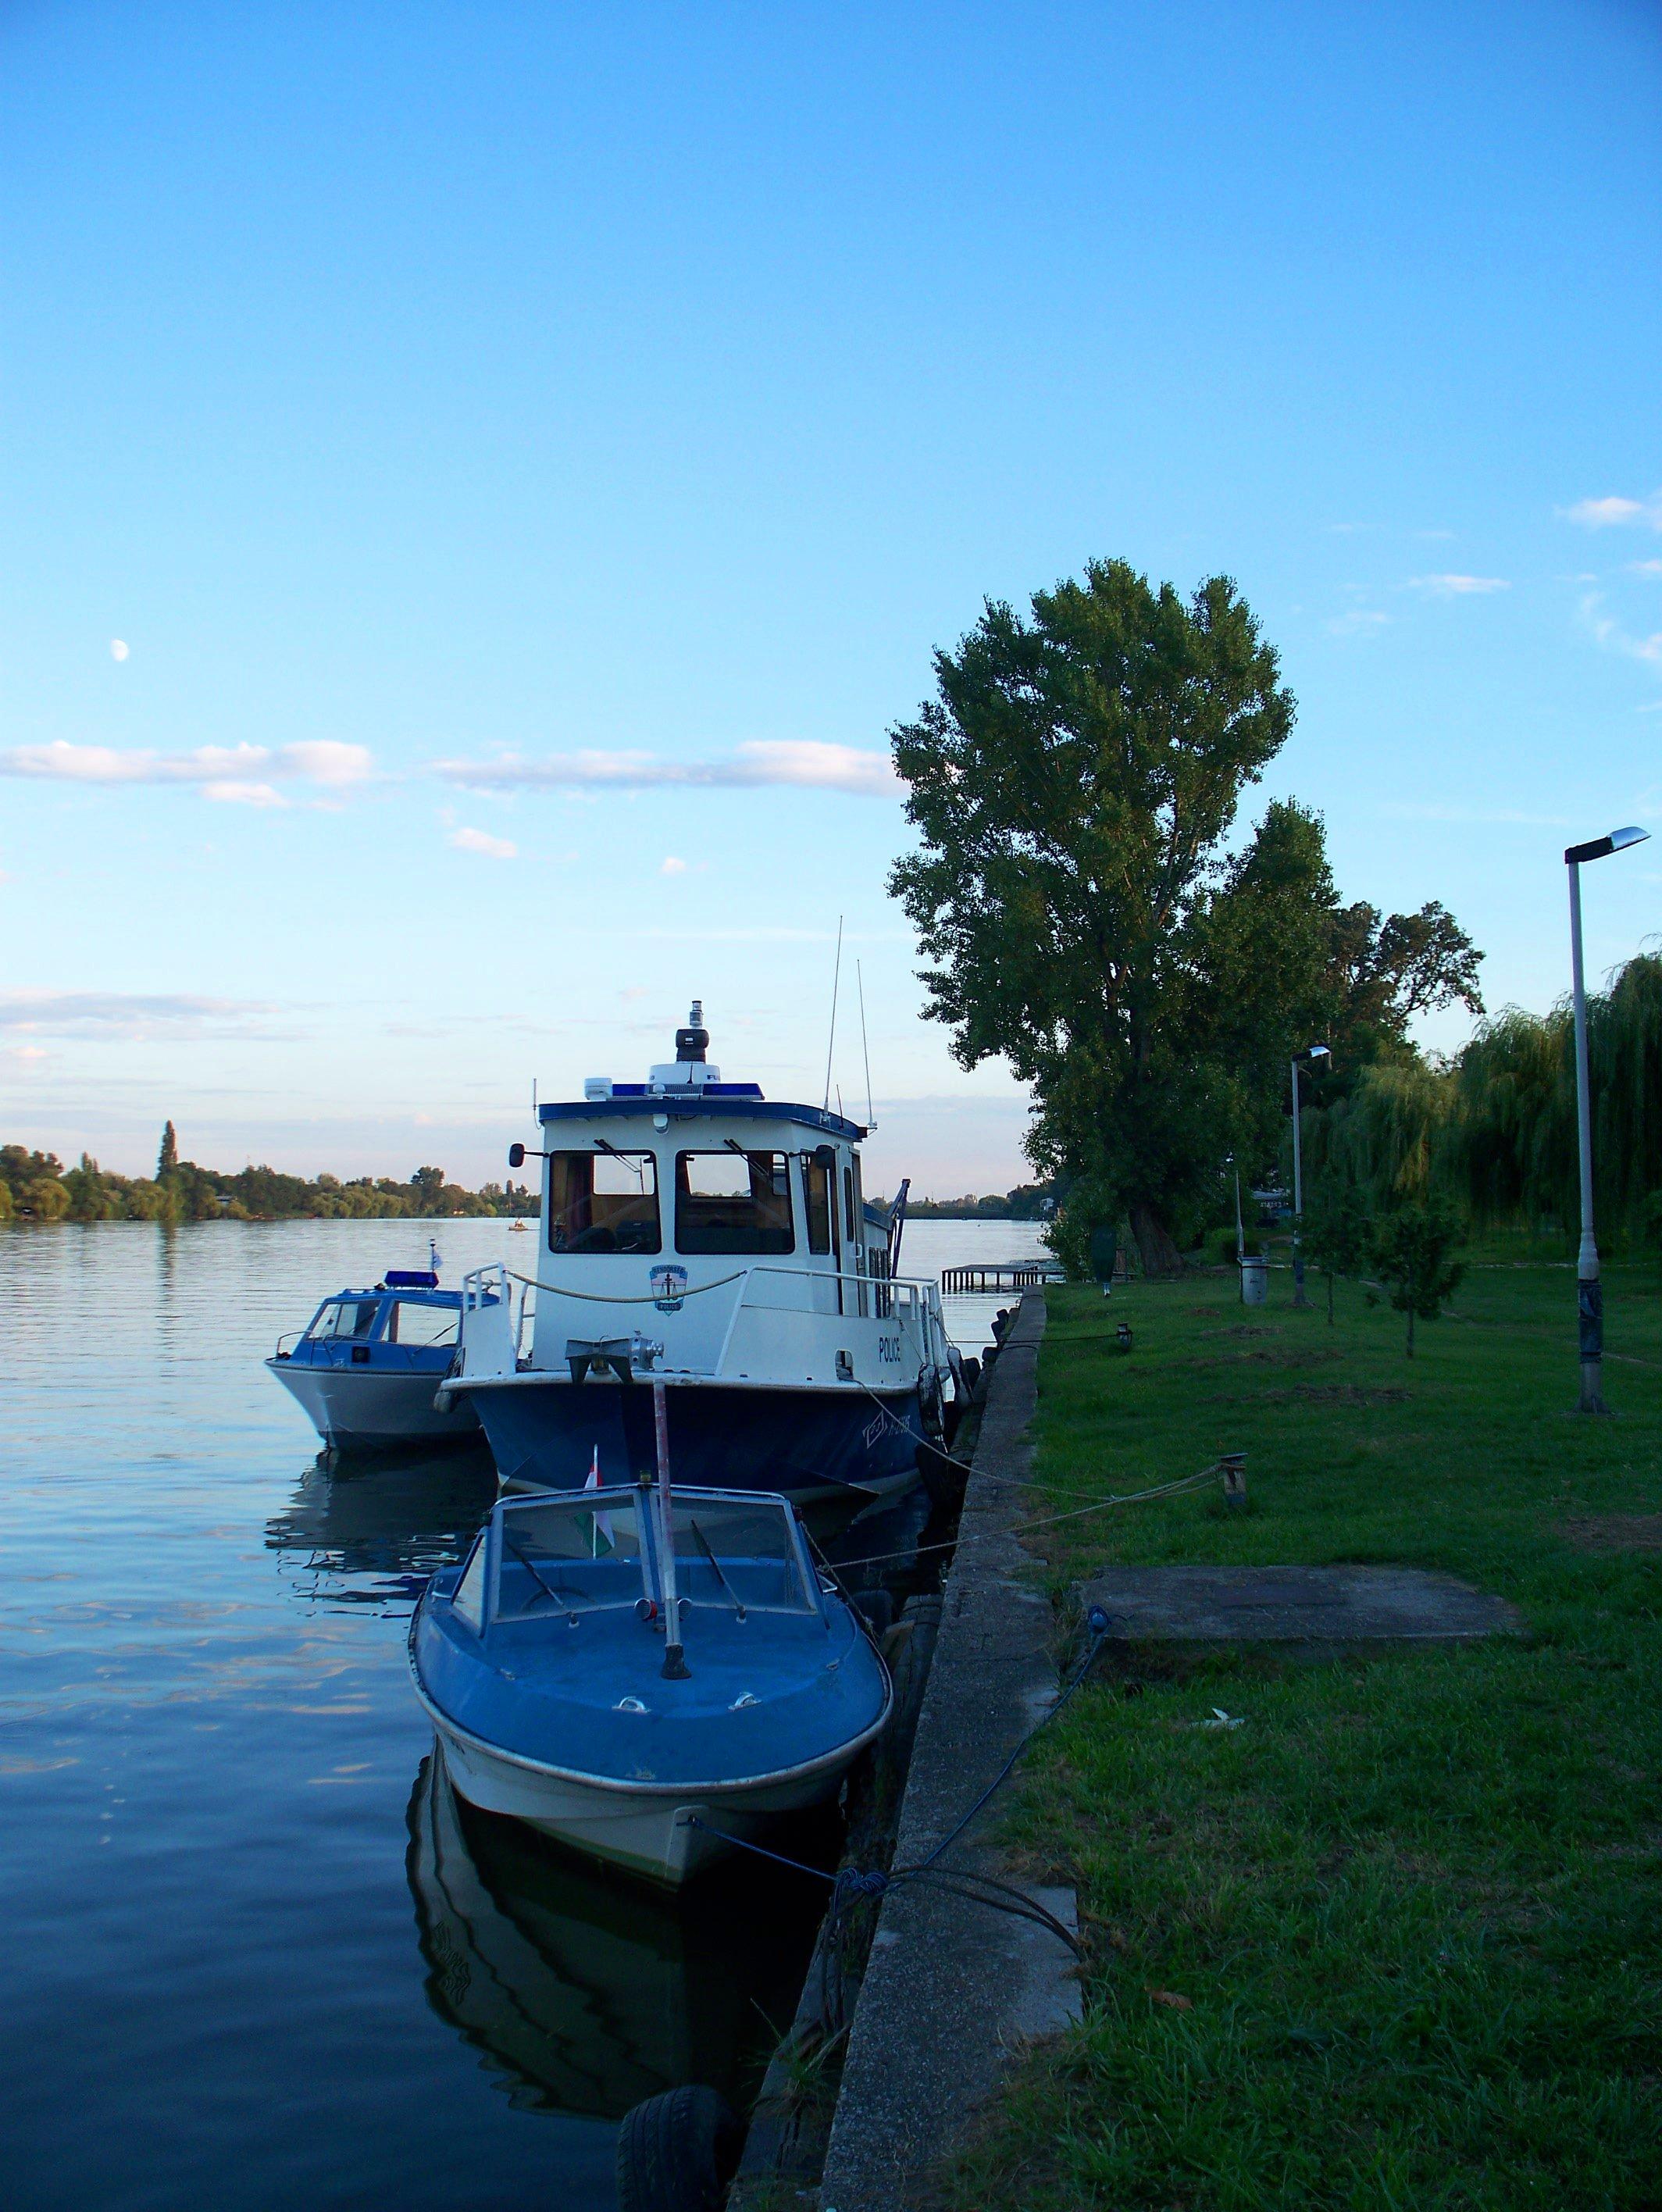 http://www.kisdunainagyhajok.hu/egyebhajok/2010_08_19_sugo_rendorsegi_hajo_malom-obolnel/2010_08_19_sugo_rendorsegi_hajo_malom-obolnel_023.jpg